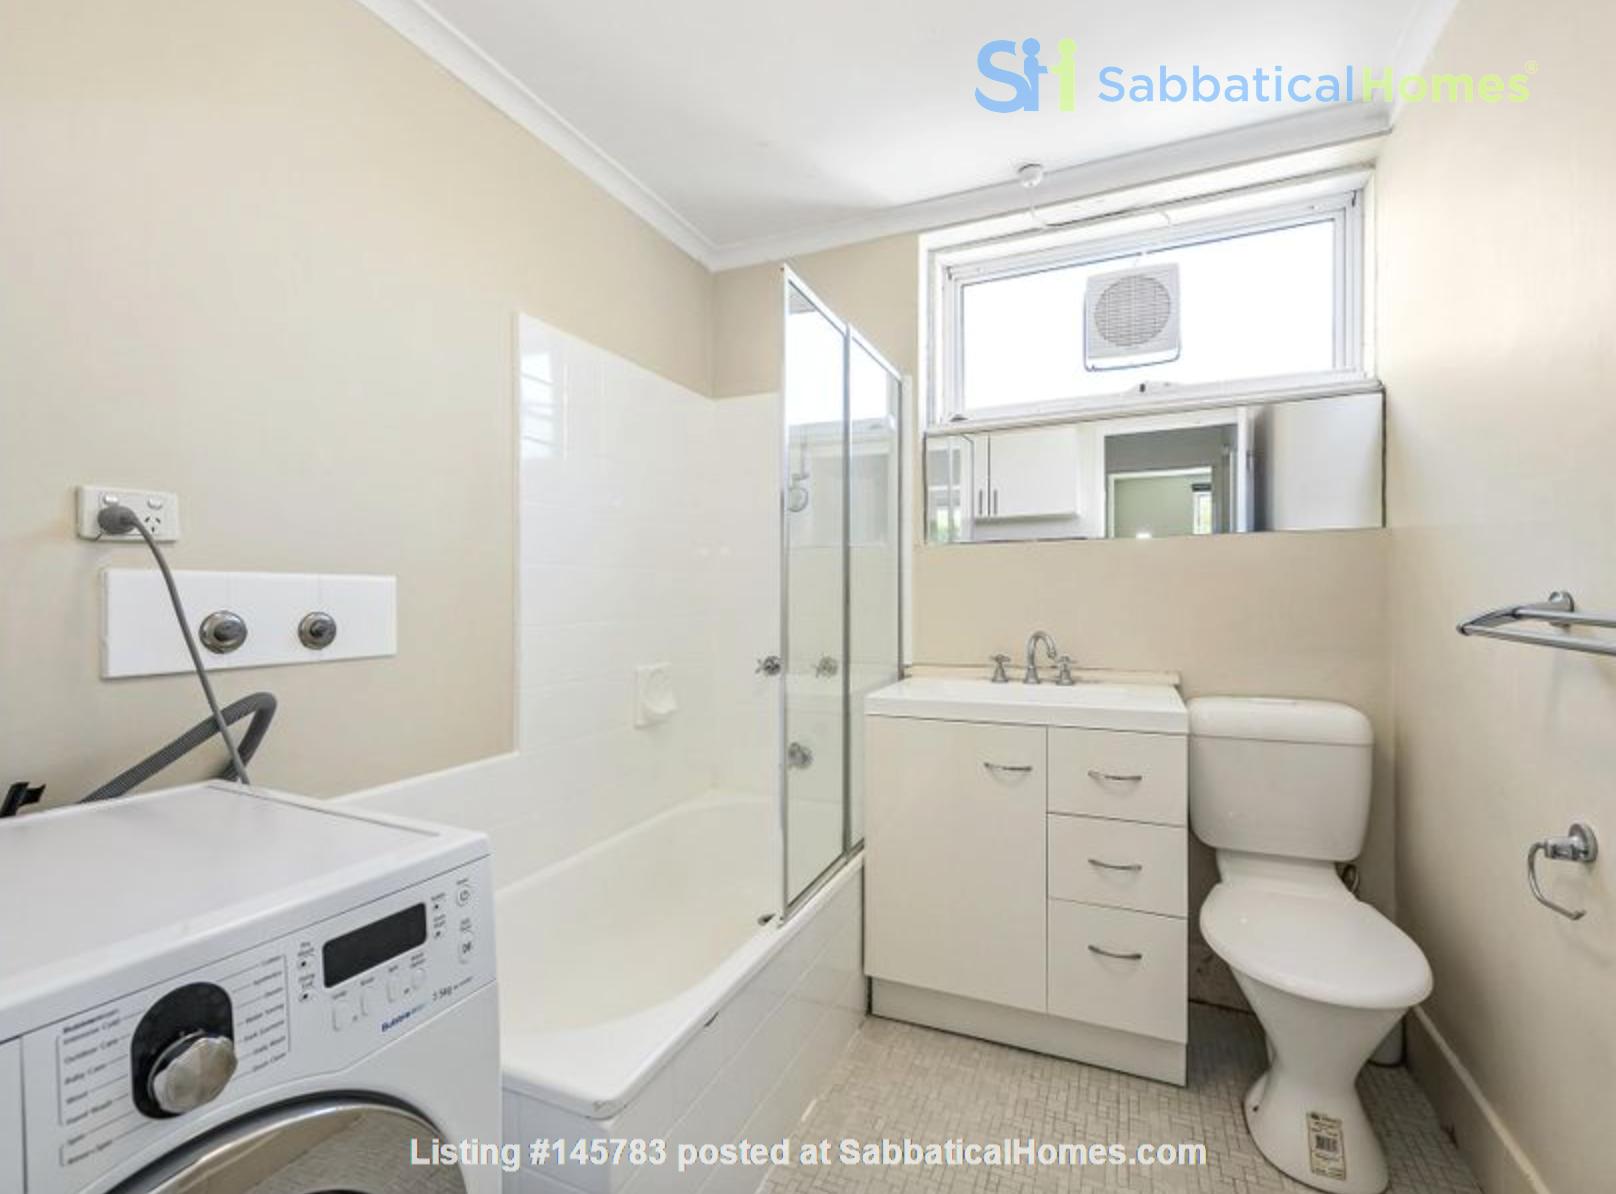 2 bedroom apartment in inner city Melbourne Home Rental in St Kilda East 4